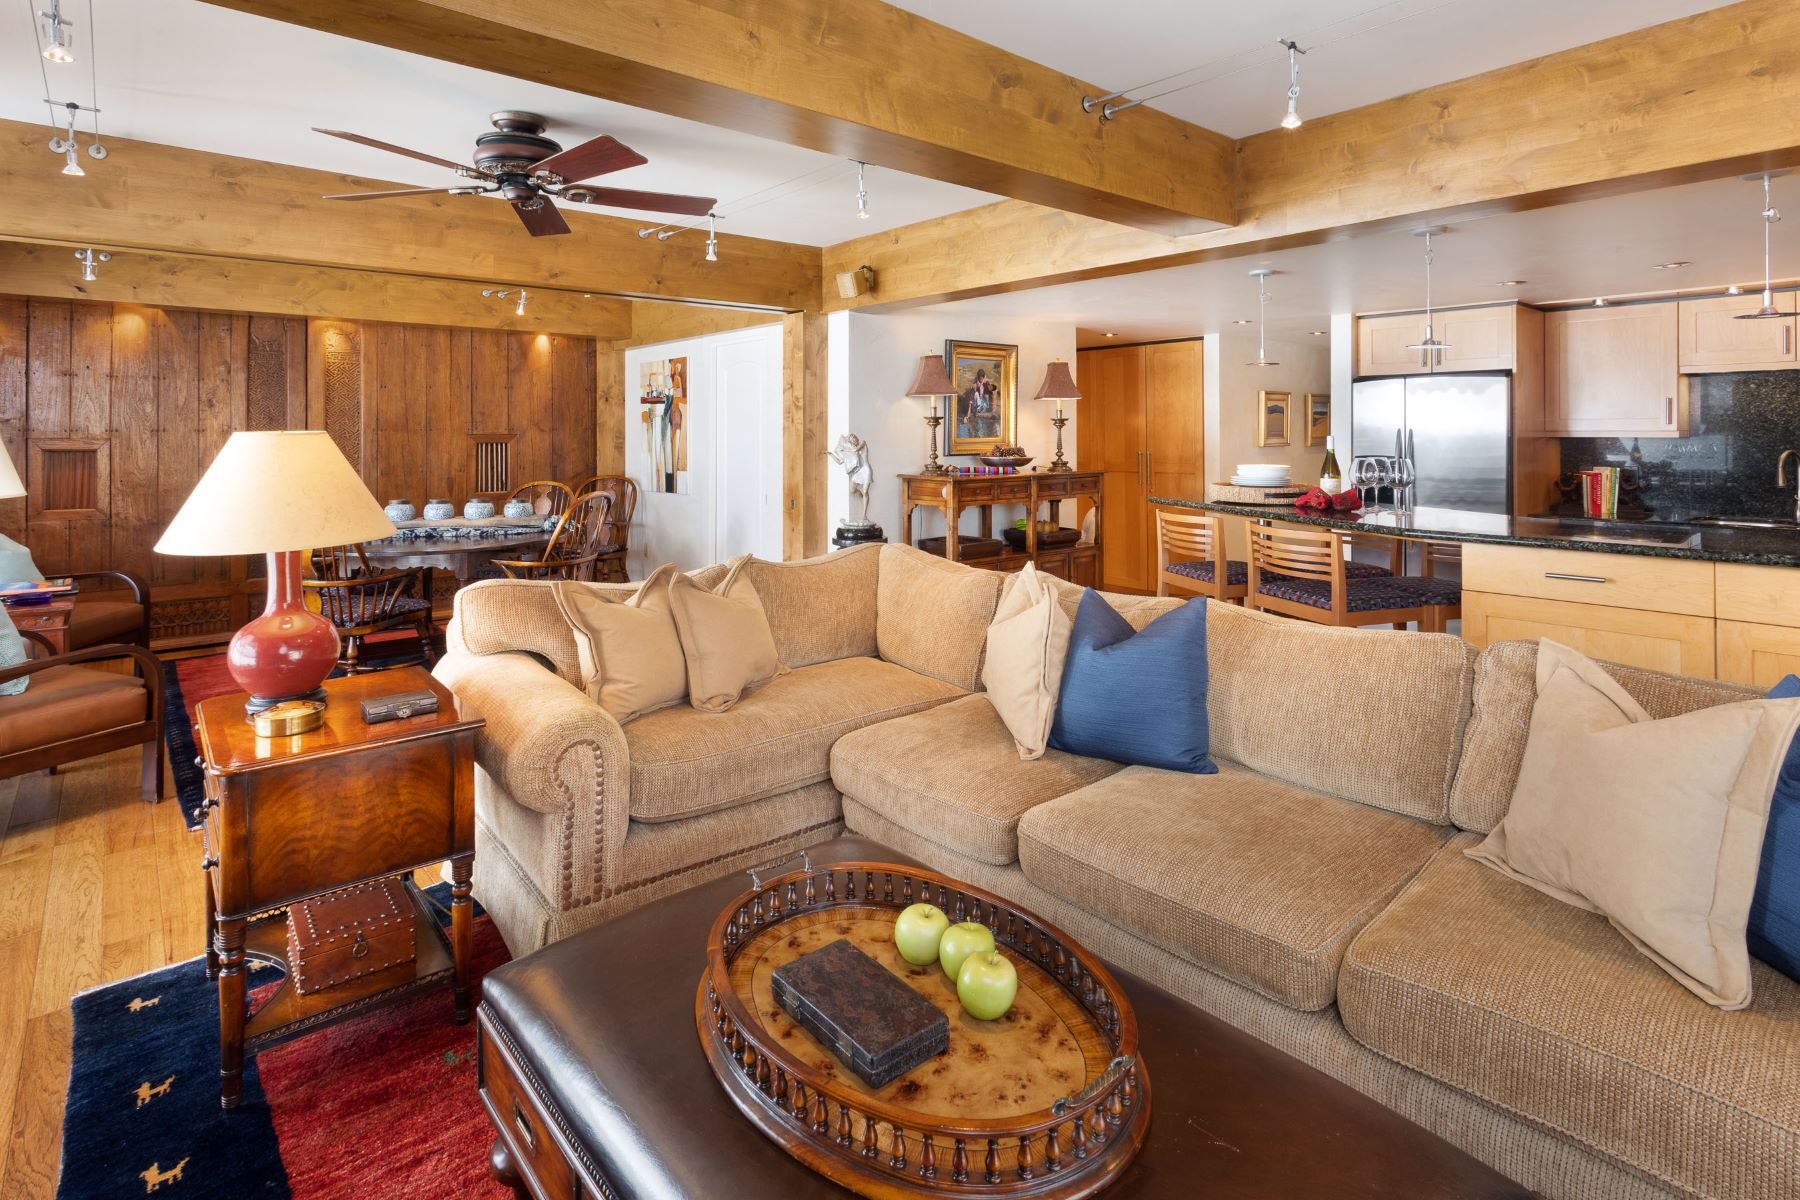 Condominiums для того Продажа на Stonebridge Condos 30 Anderson Lane, #600, Snowmass Village, Колорадо 81615 Соединенные Штаты